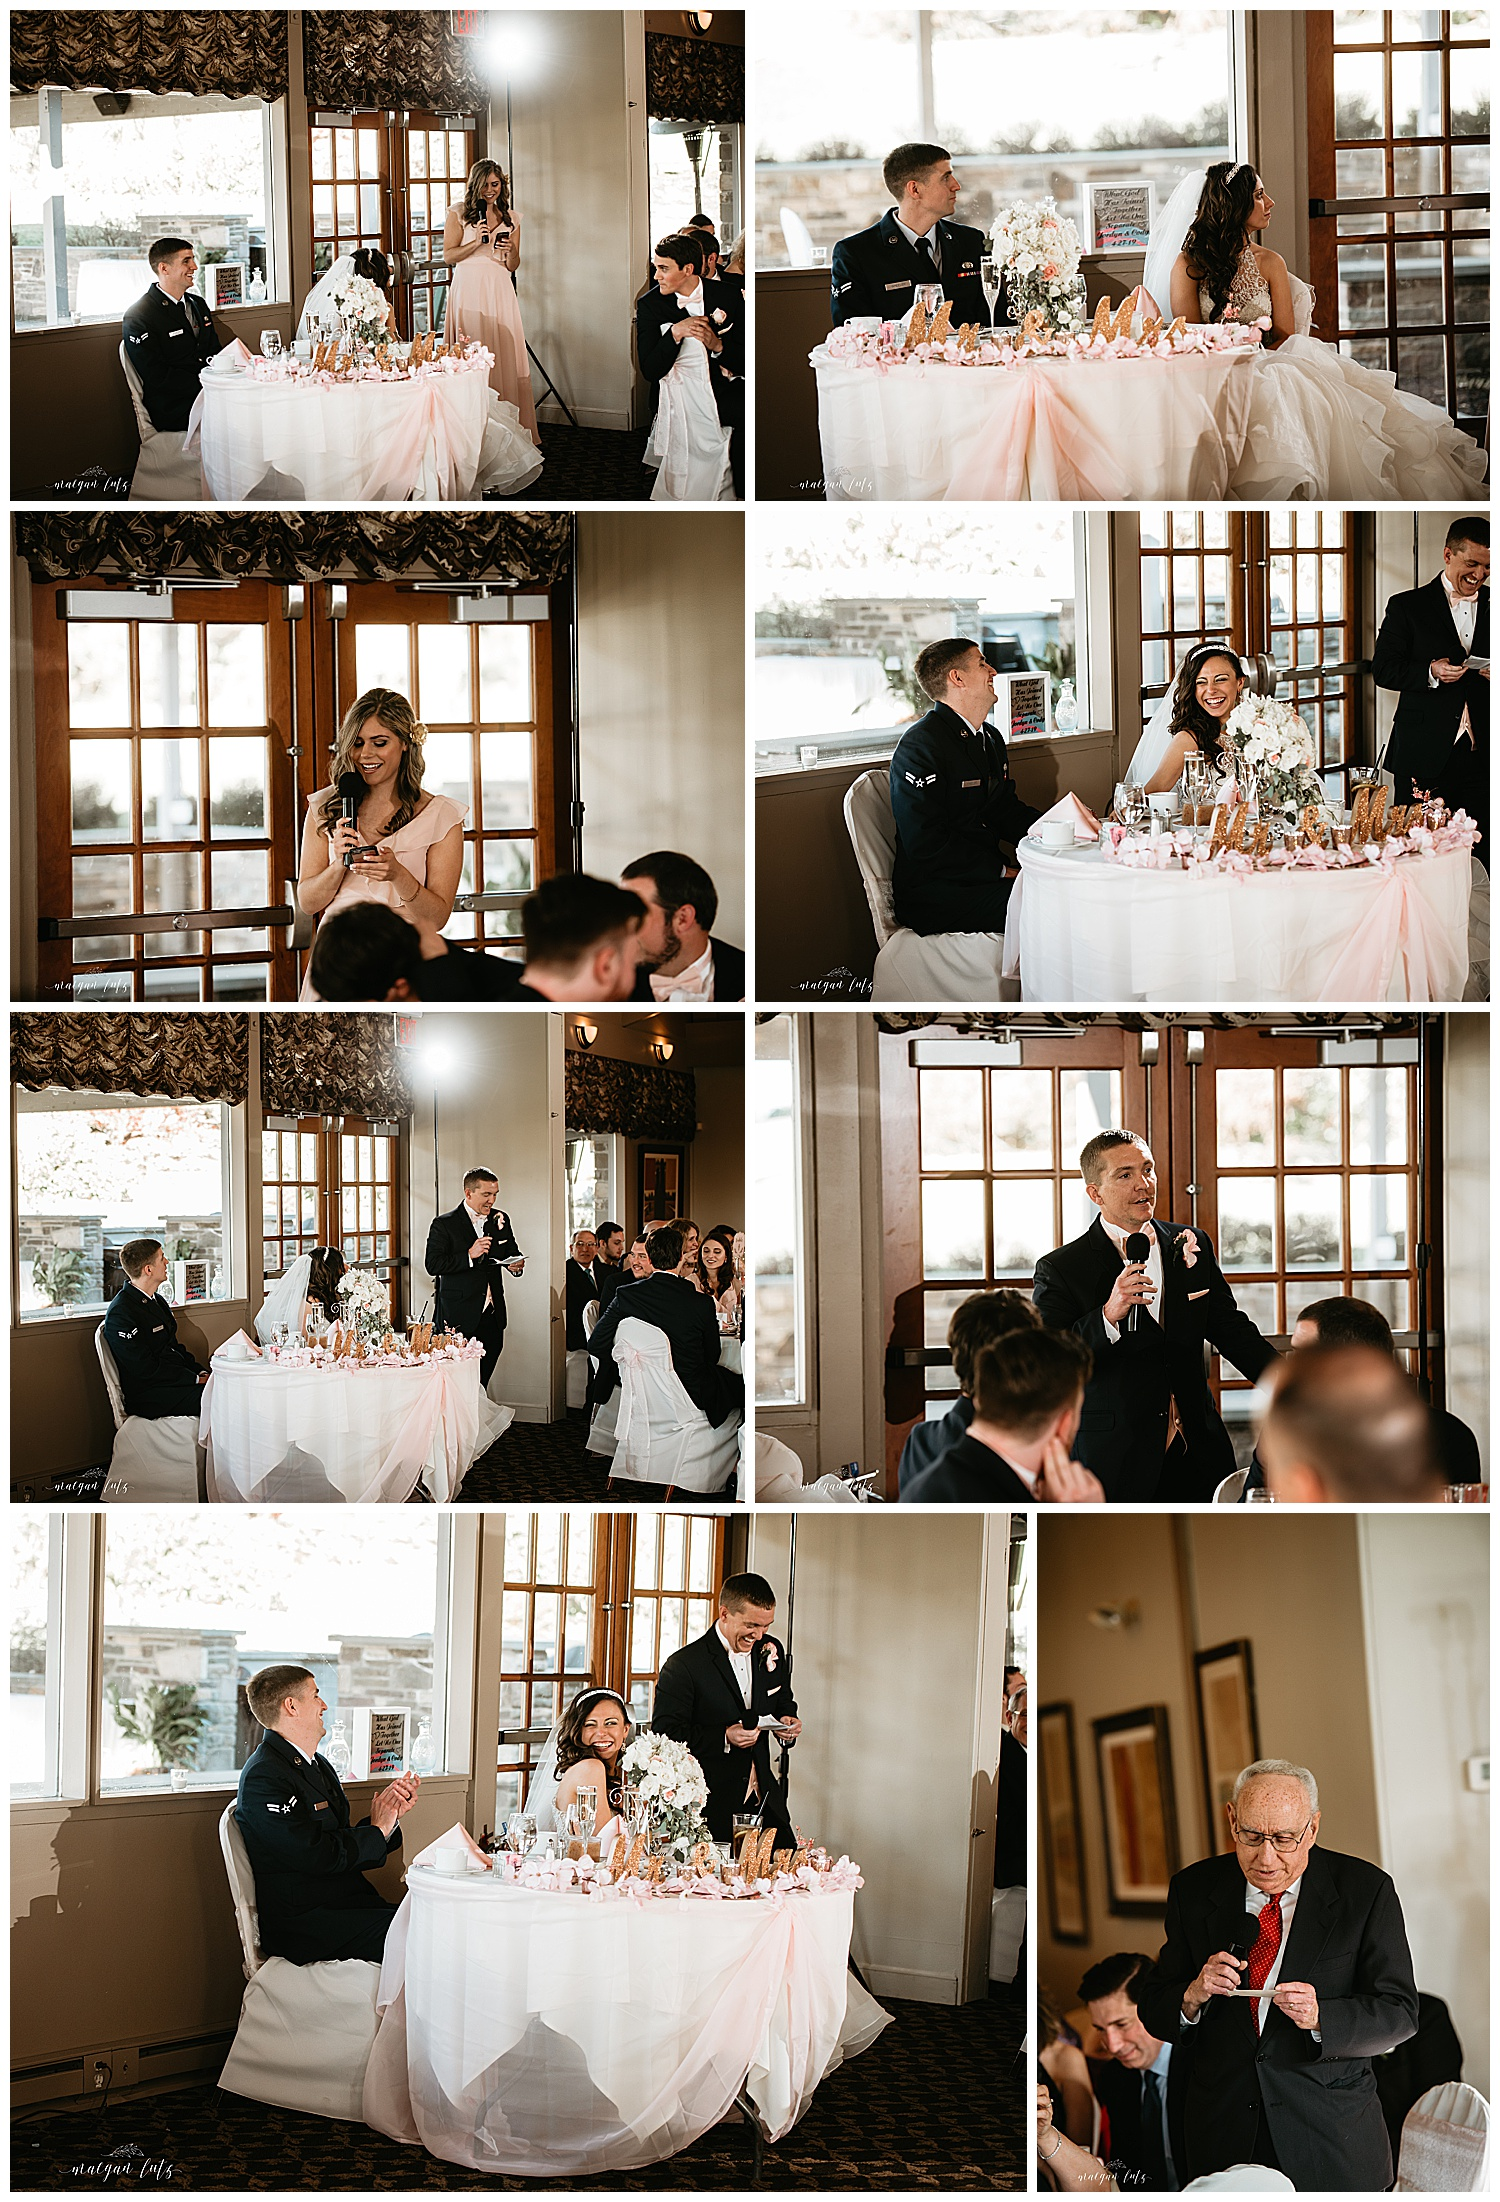 NEPA-Lehigh-Valley-Wedding-Photographer-at-Glen-Oak-Country-Club-Clarks-Summit-PA_0057.jpg